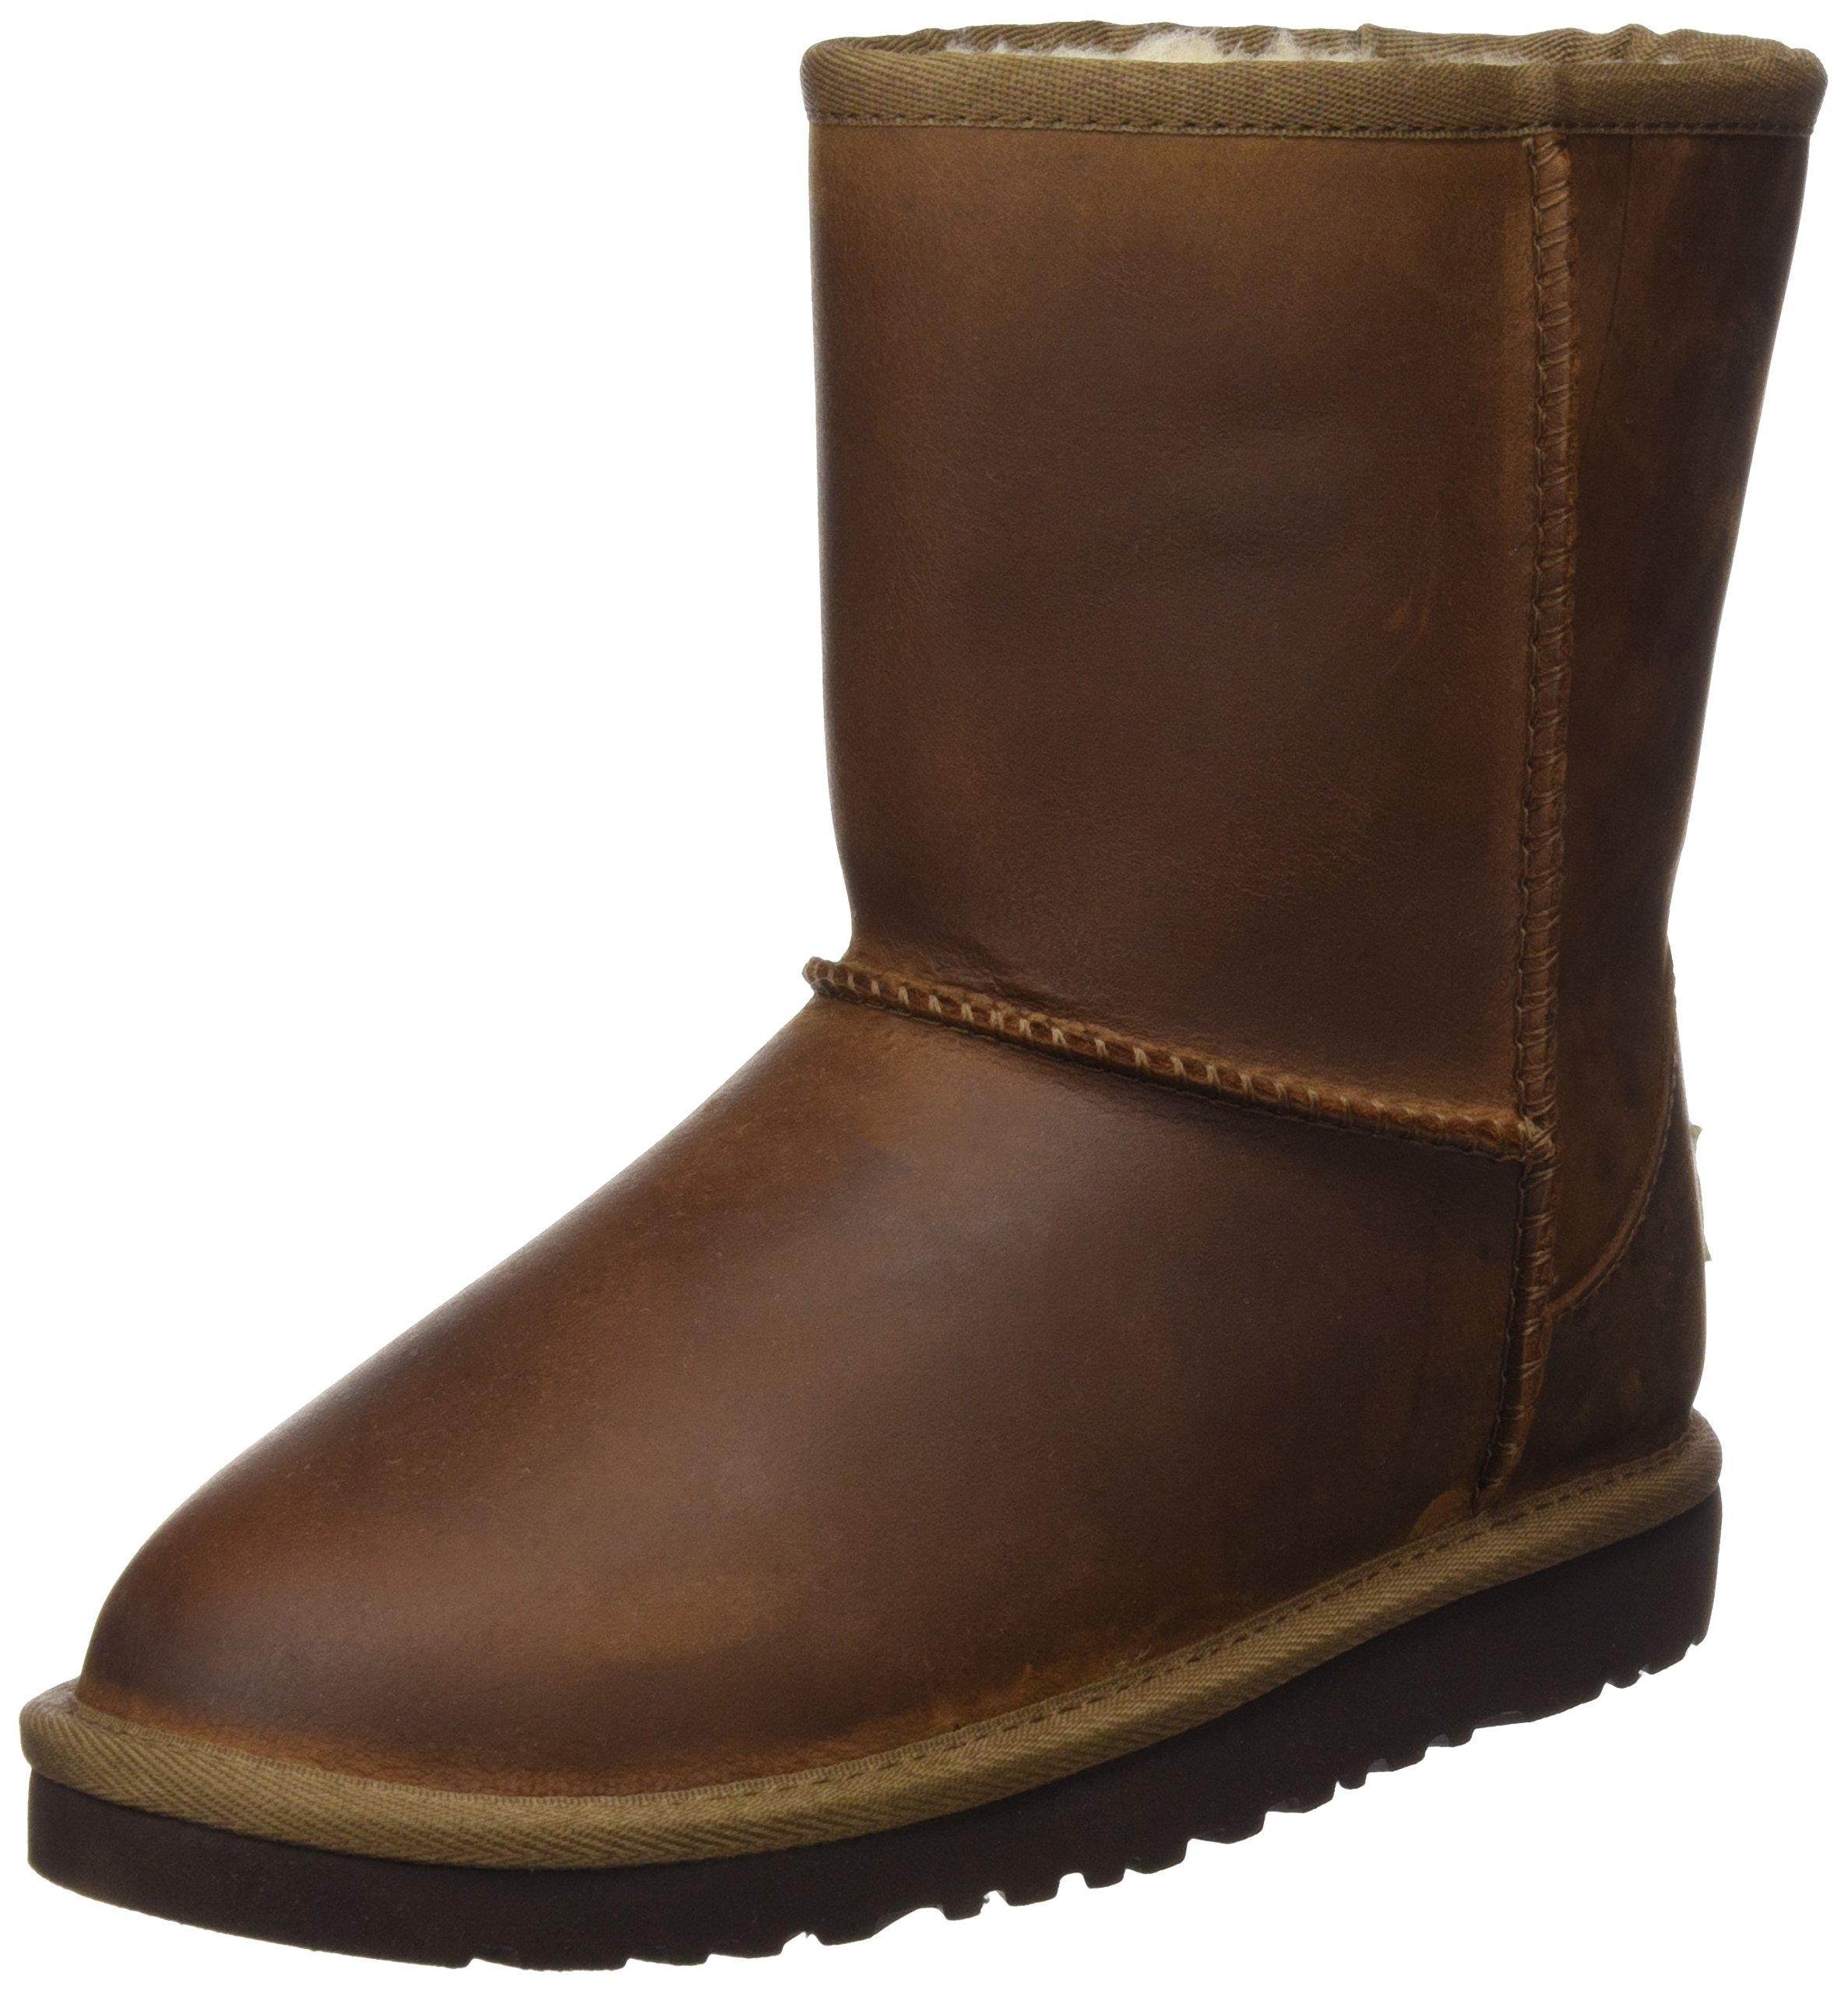 UGG Australia Girls Classic Short Leather Boot Chestnut Size 3